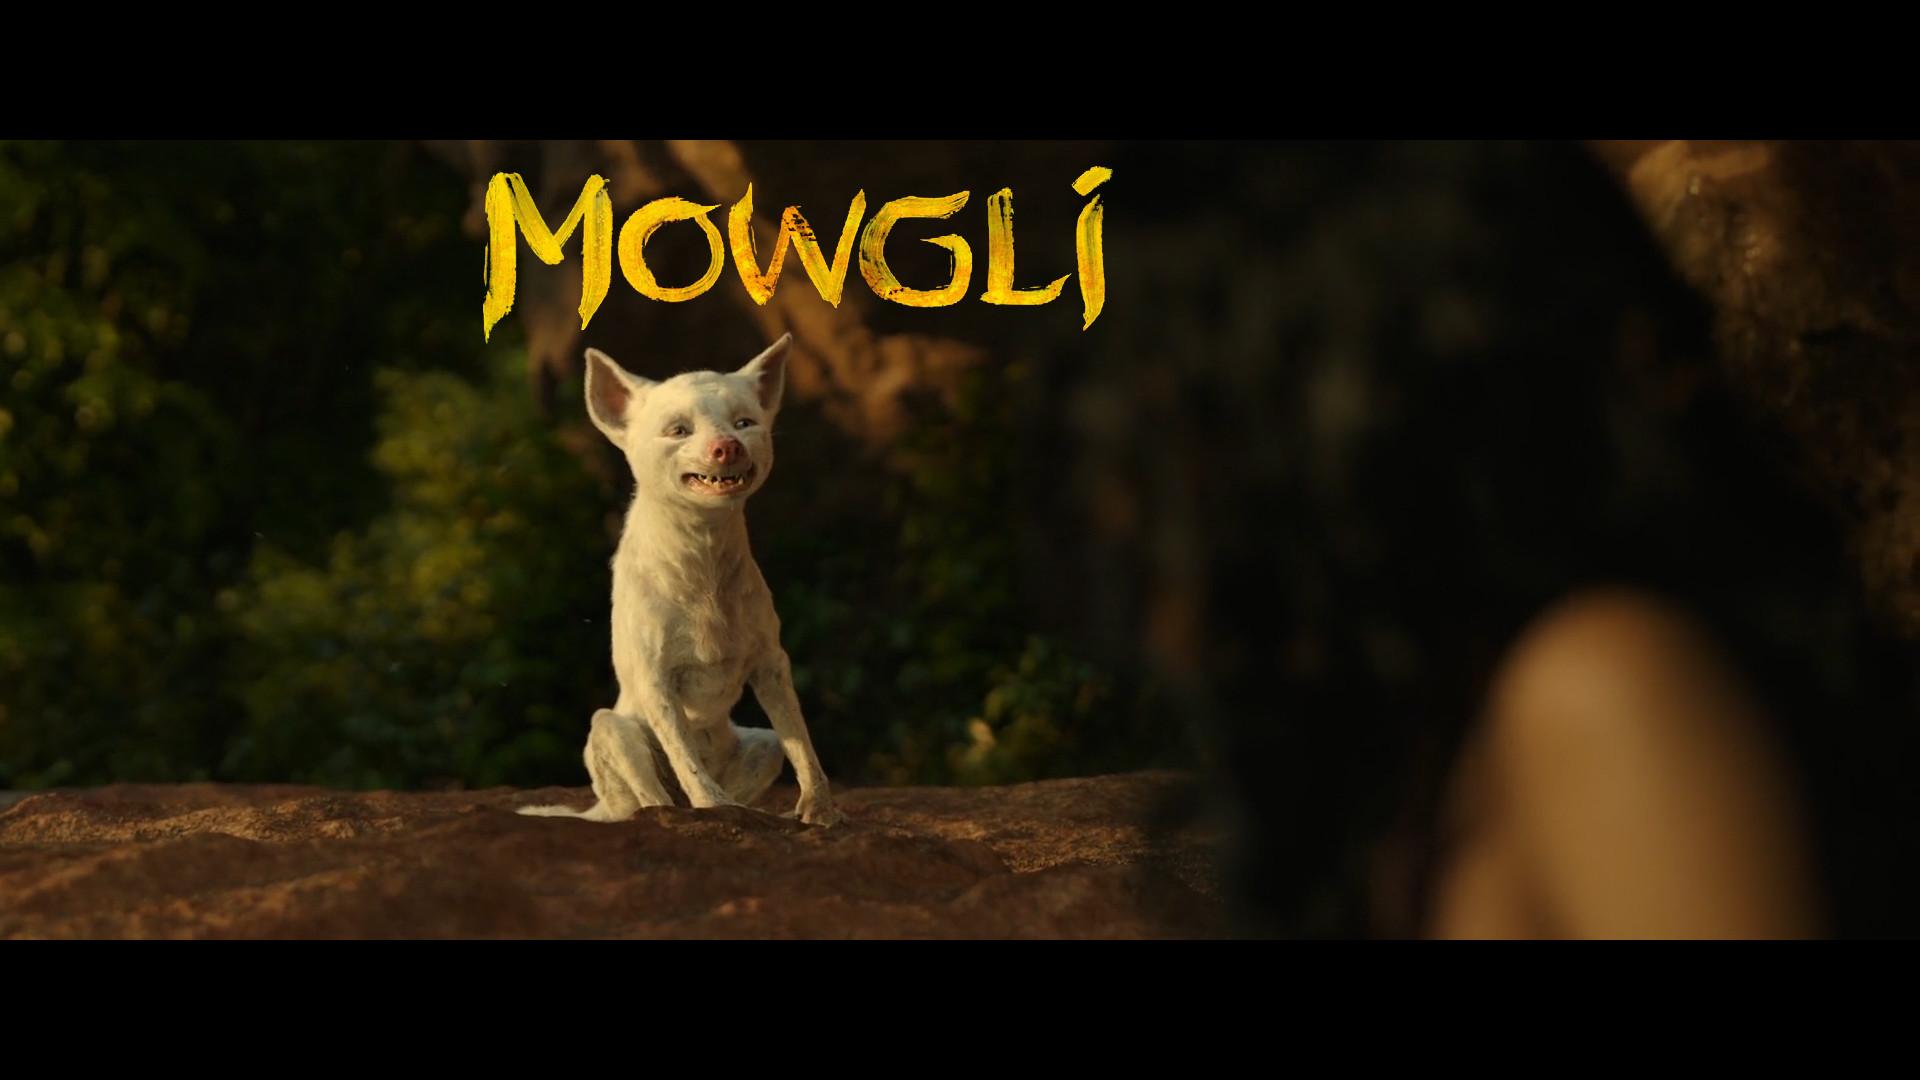 ArtStation - MOWGLI: Legend of the Jungle - Animation Reel